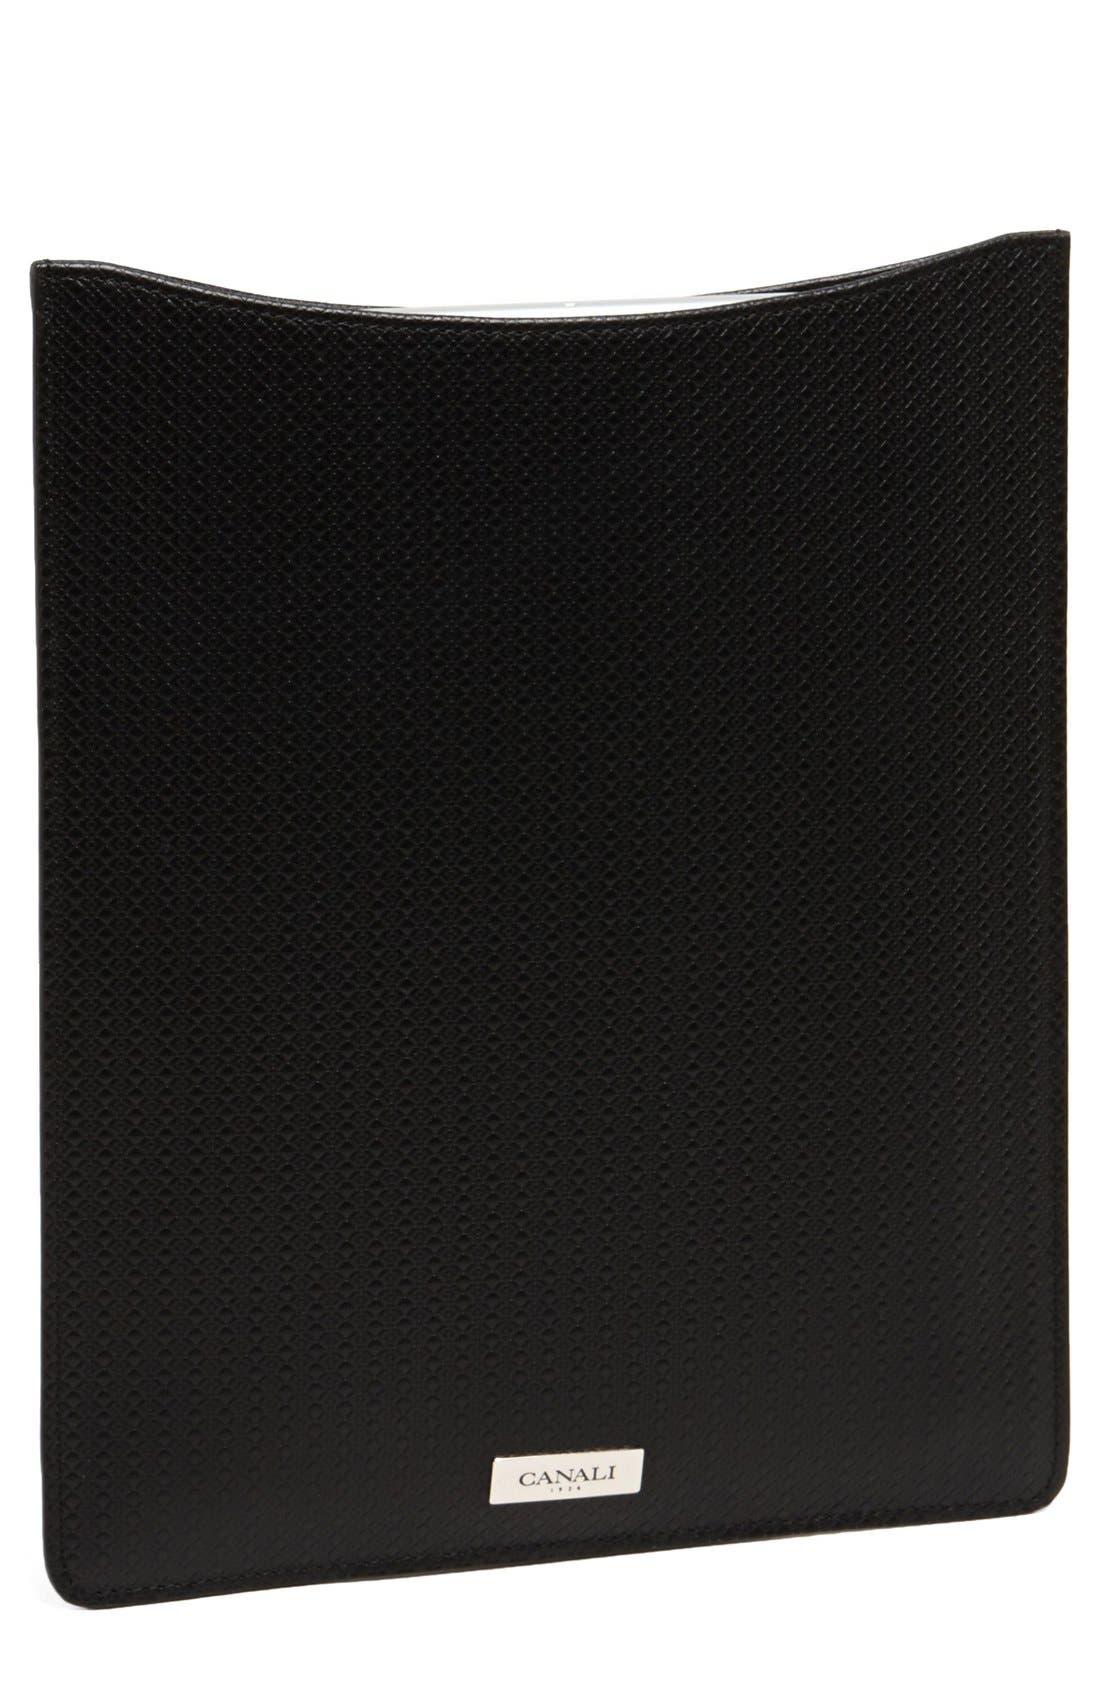 Main Image - Canali Leather iPad Sleeve